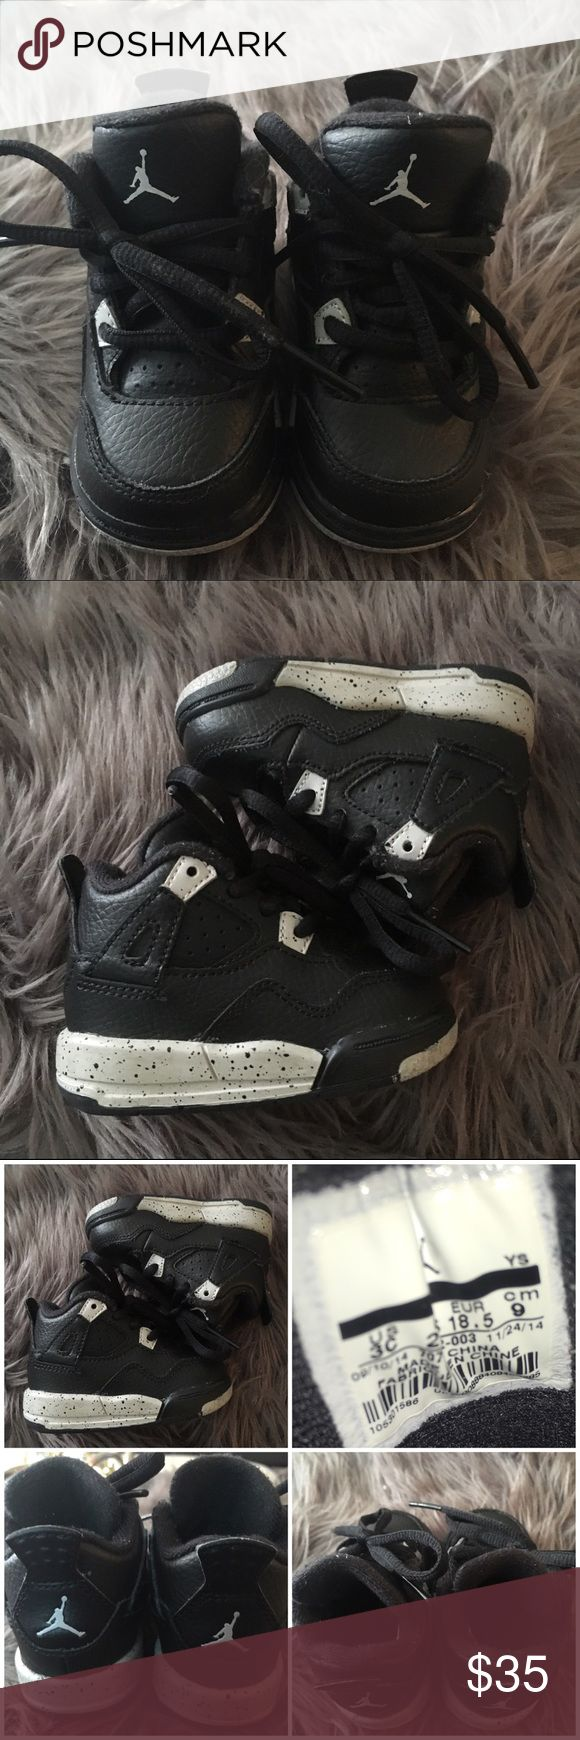 Baby Nike Air Jordan Retro 4 (Oreo) Baby Air Jordan Retro 4 sz 3C. Great condition. Listing for shoes only Jordan Shoes Sneakers